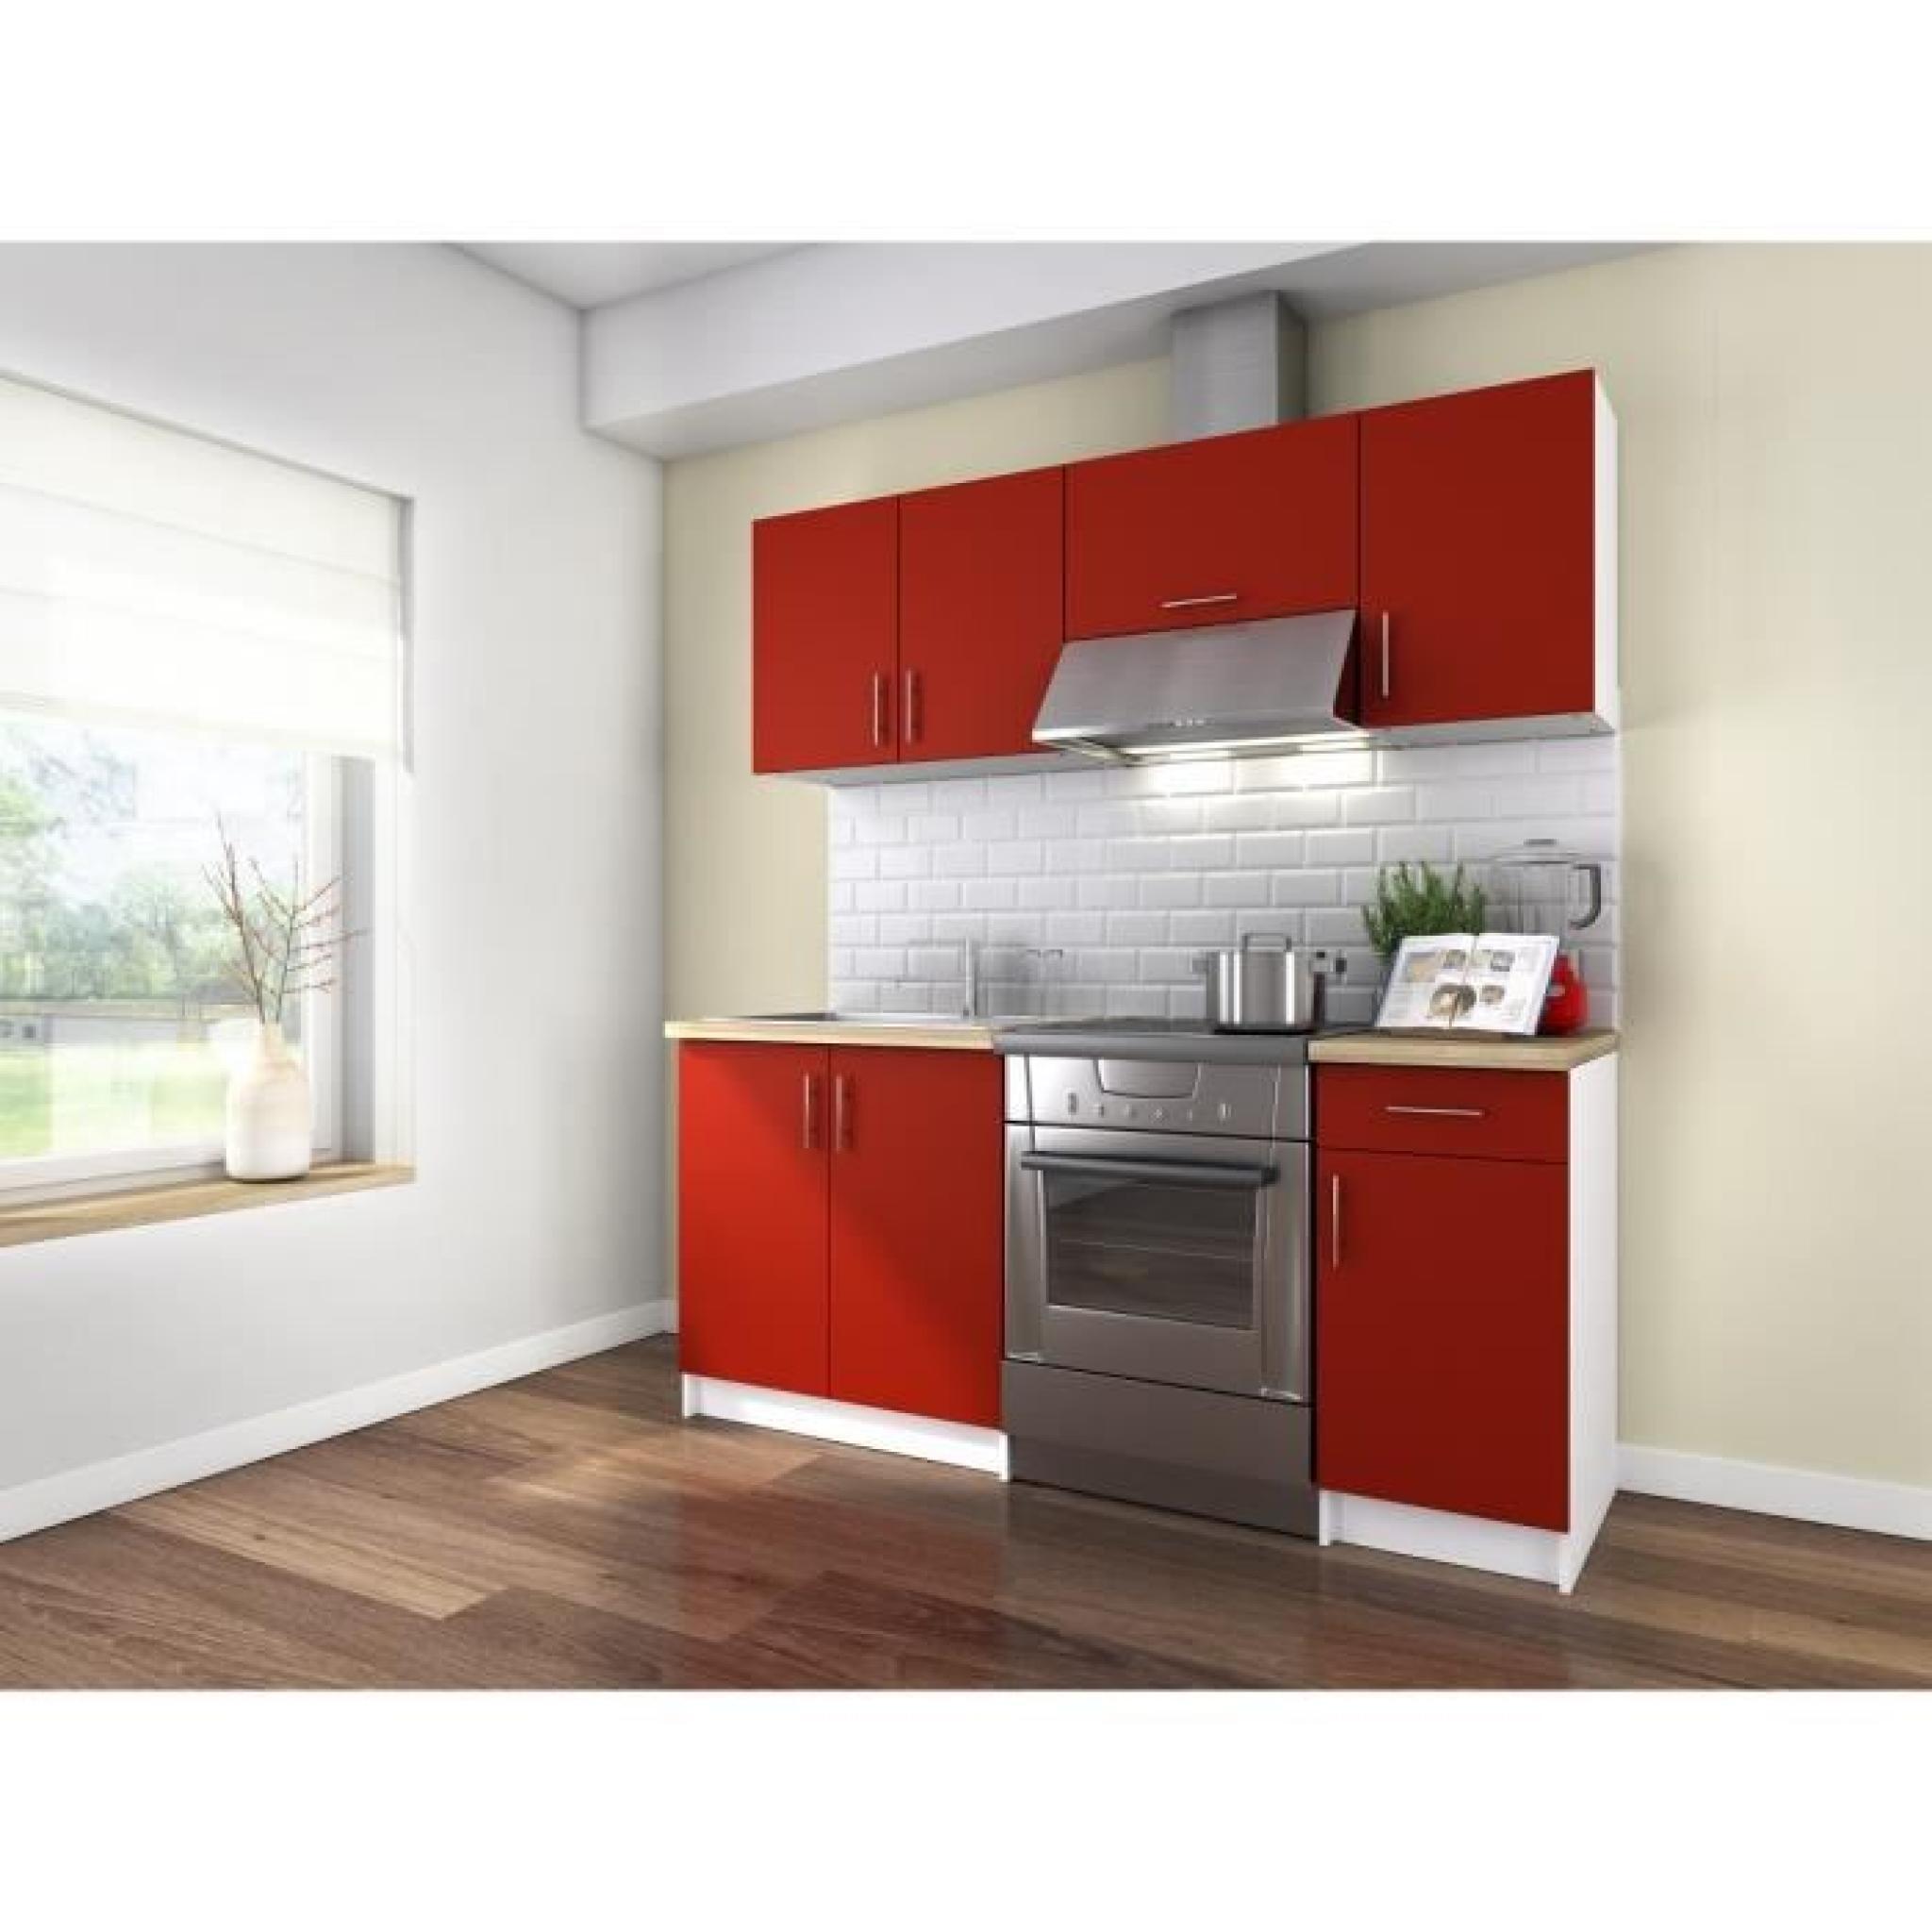 Obi cuisine compl te 1m80 rouge mat achat vente for Cuisine complete design